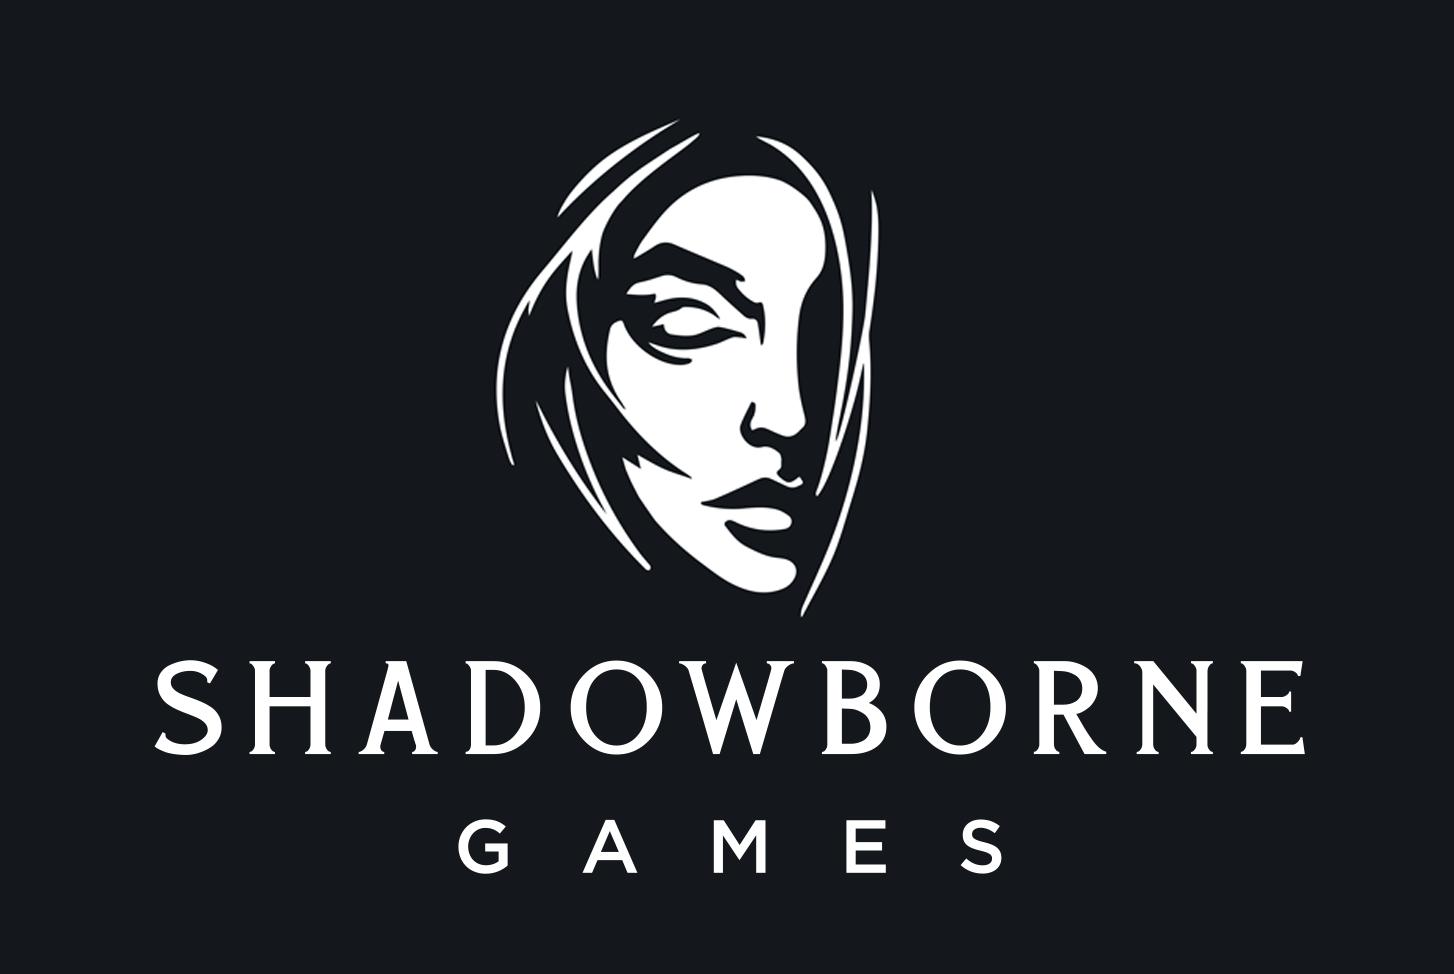 Shadowborne Games